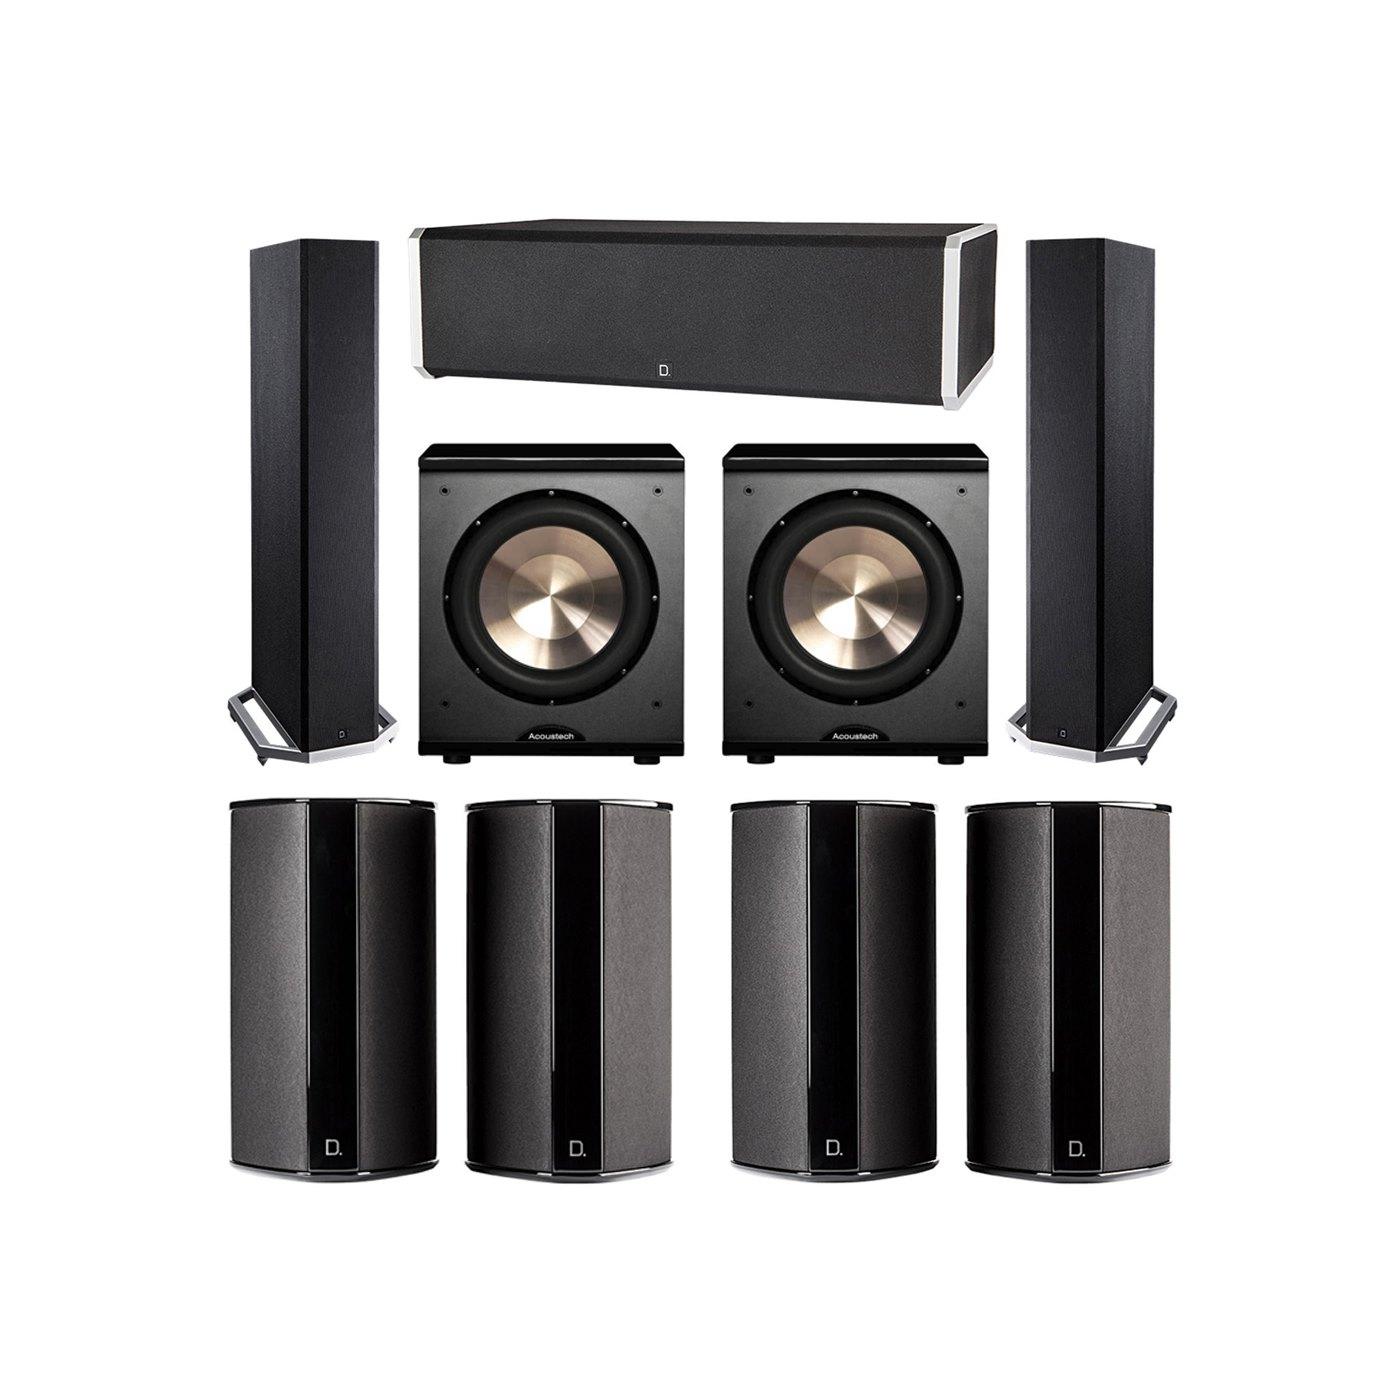 Definitive Technology 7.2 System with 2 BP9020 Tower Speakers, 1 CS9060 Center Channel Speaker, 4 SR9080 Surround Speaker, 2 BIC PL-200 Subwoofer